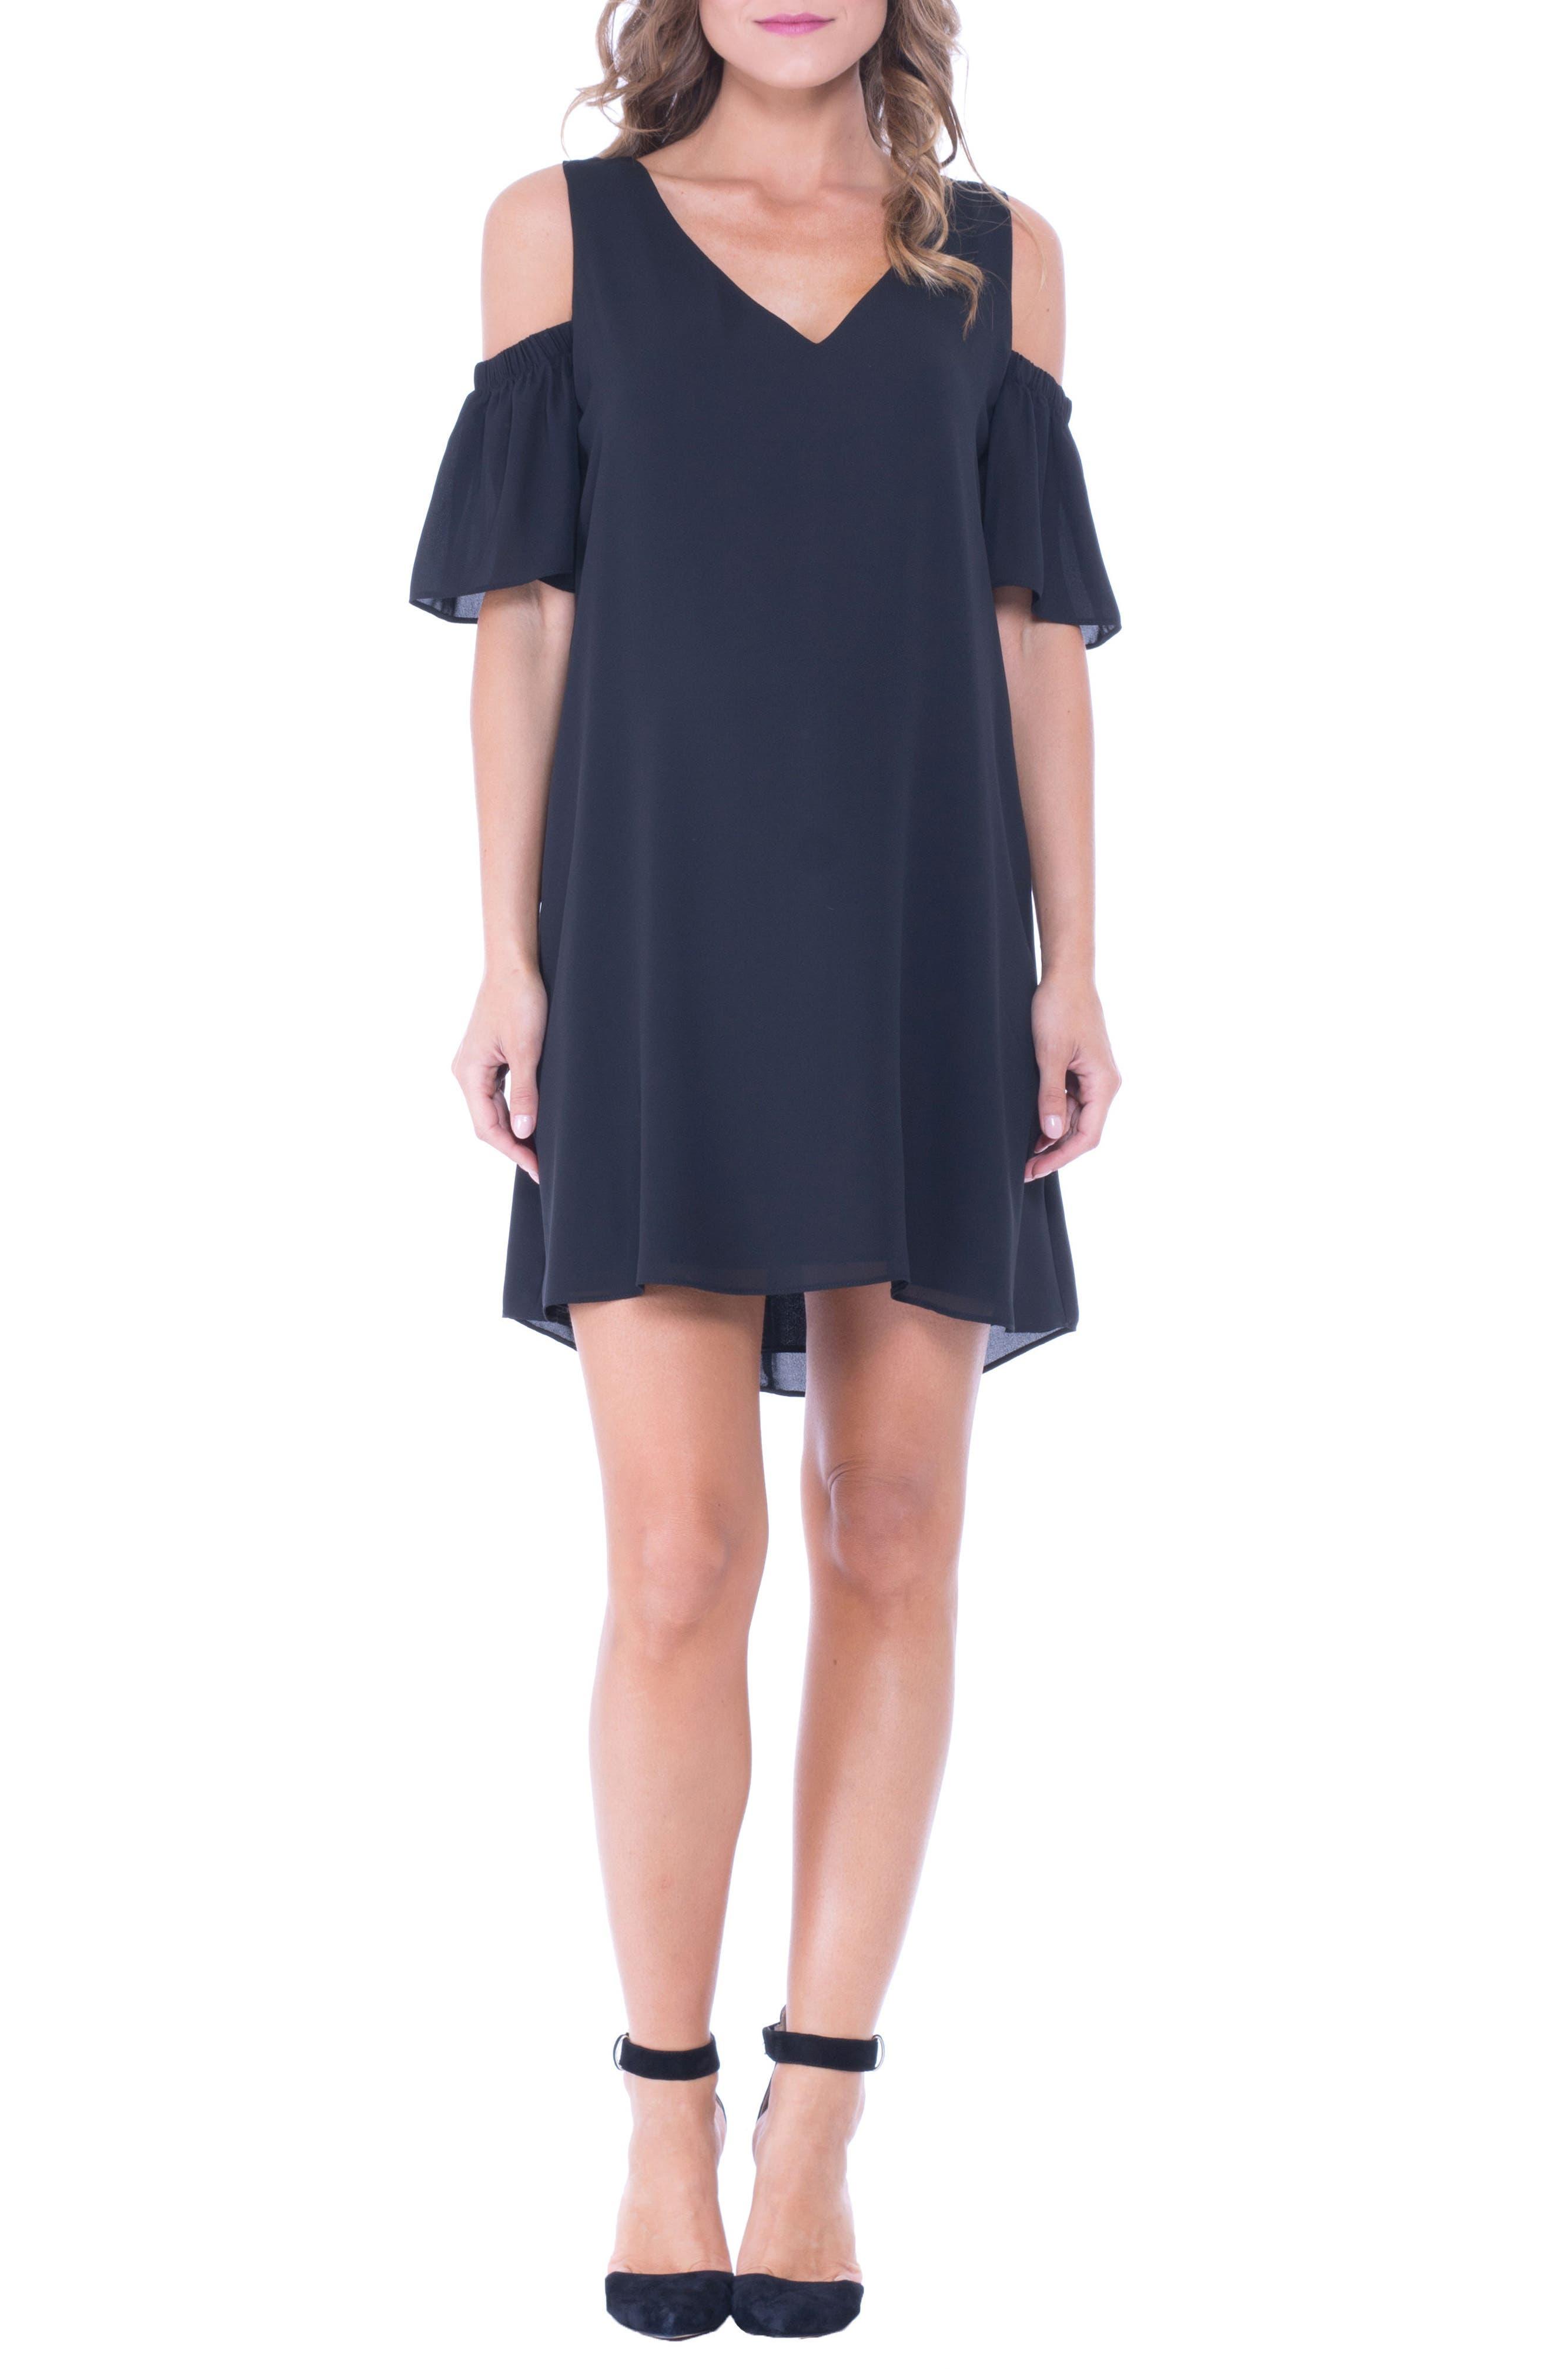 Main Image - Olian Juliette Cold Shoulder Maternity Dress